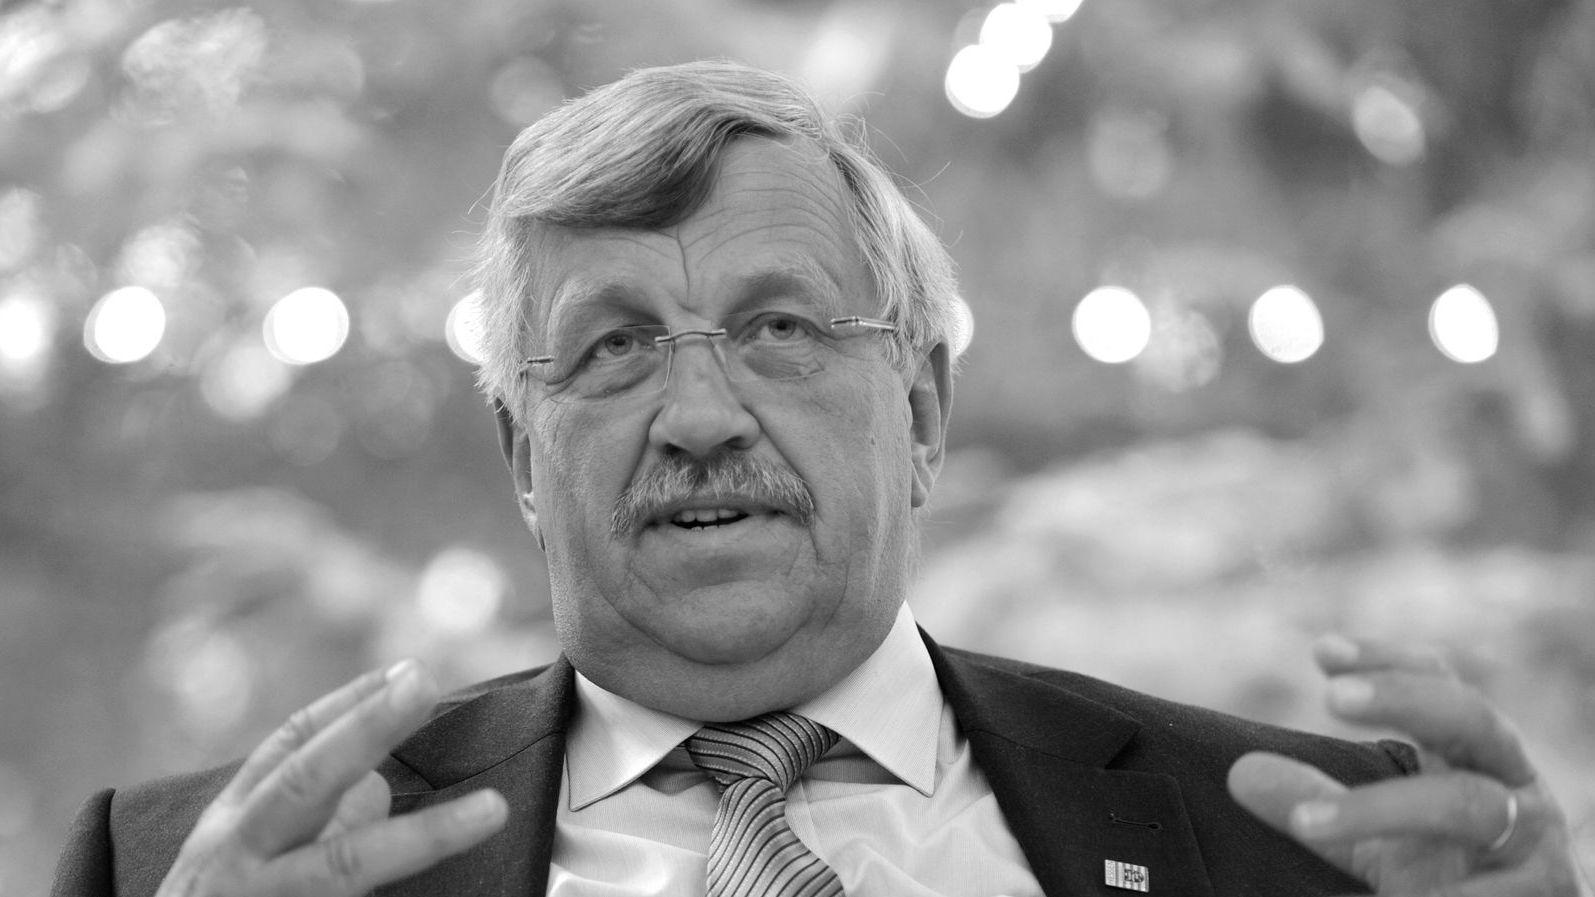 Der ermordete CDU-Politiker Walter Lübcke